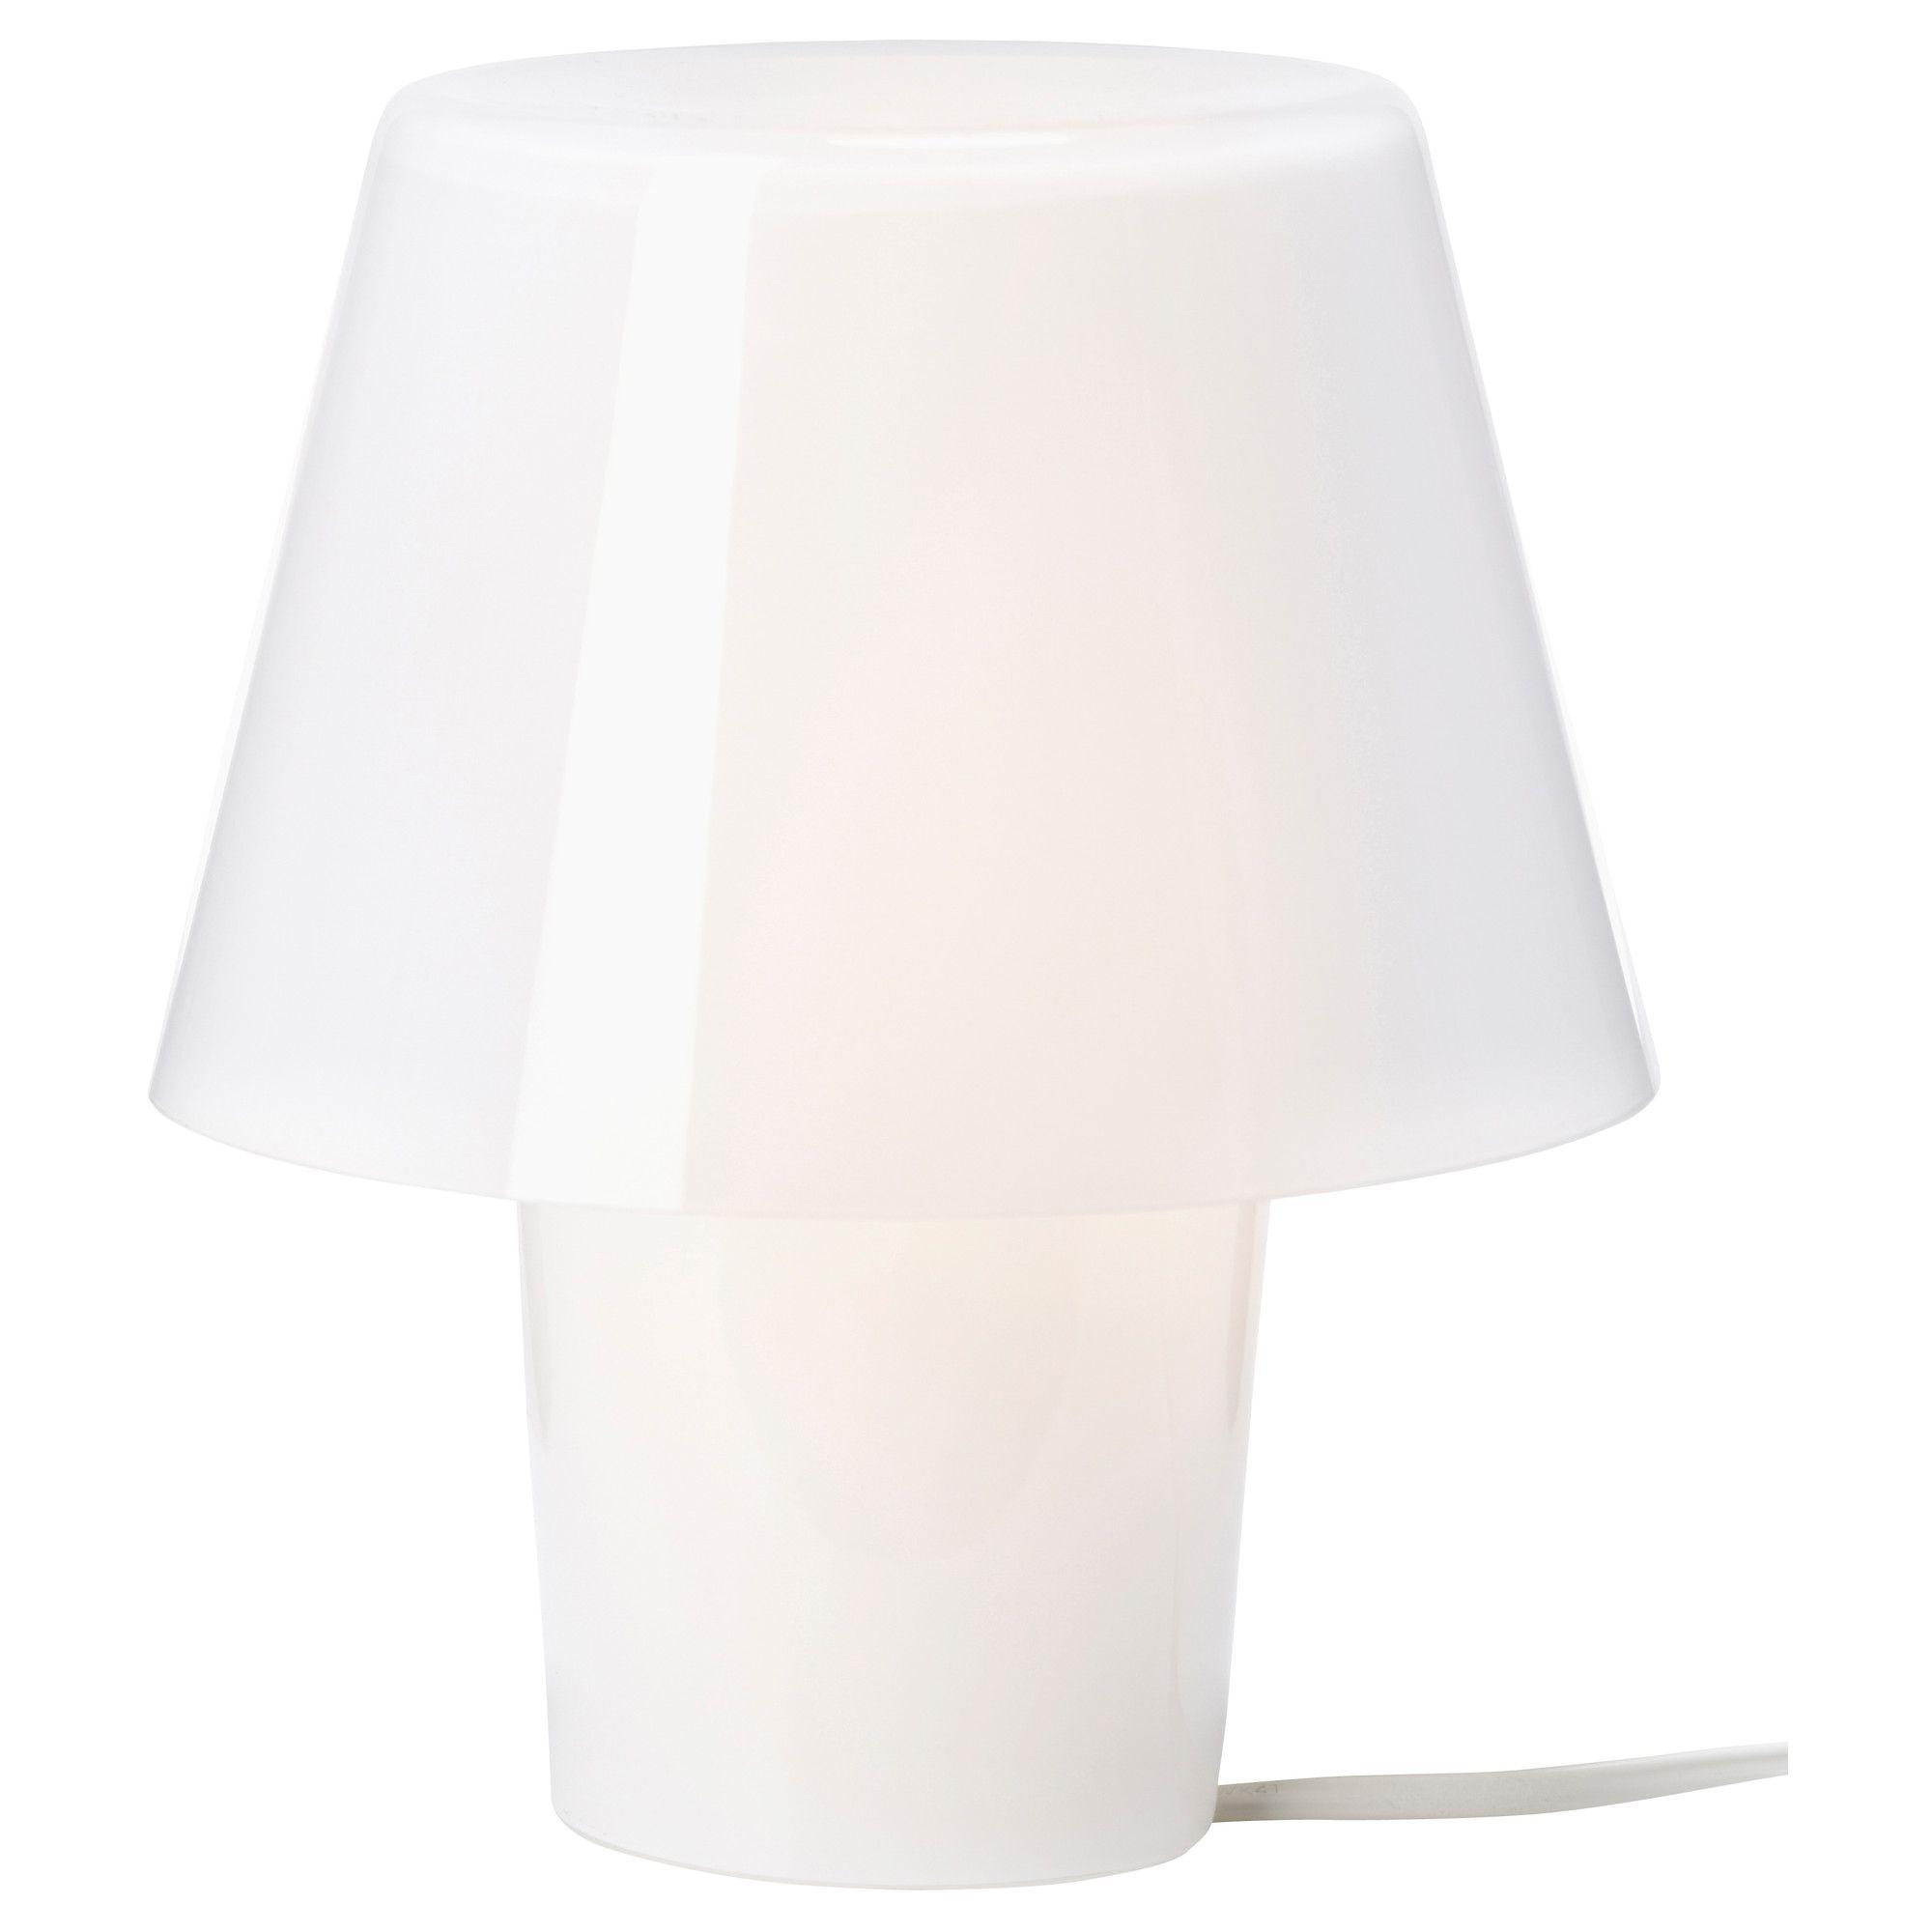 lampe de chevet ikea blanche | creapach